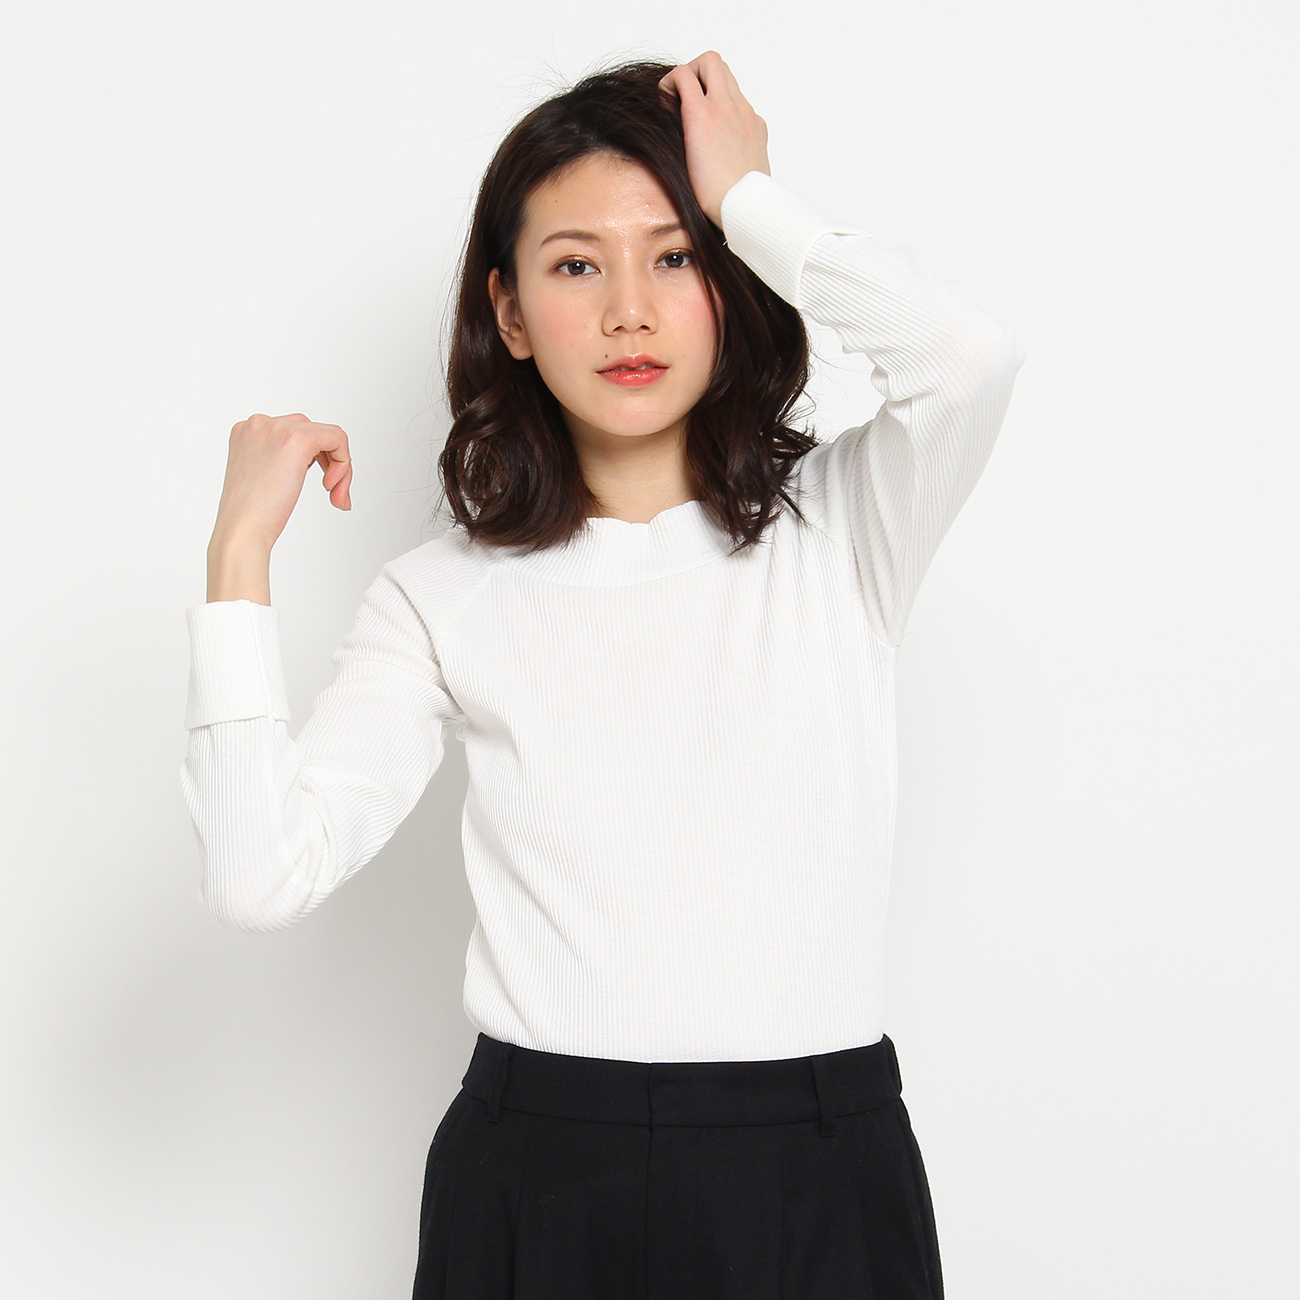 【THE SHOP TK(Ladies) (ザ ショップ ティーケー(レディース))】【吸水速乾】2WAYオフショルダープルオーバーレディース トップス カットソー・Tシャツ オフホワイト